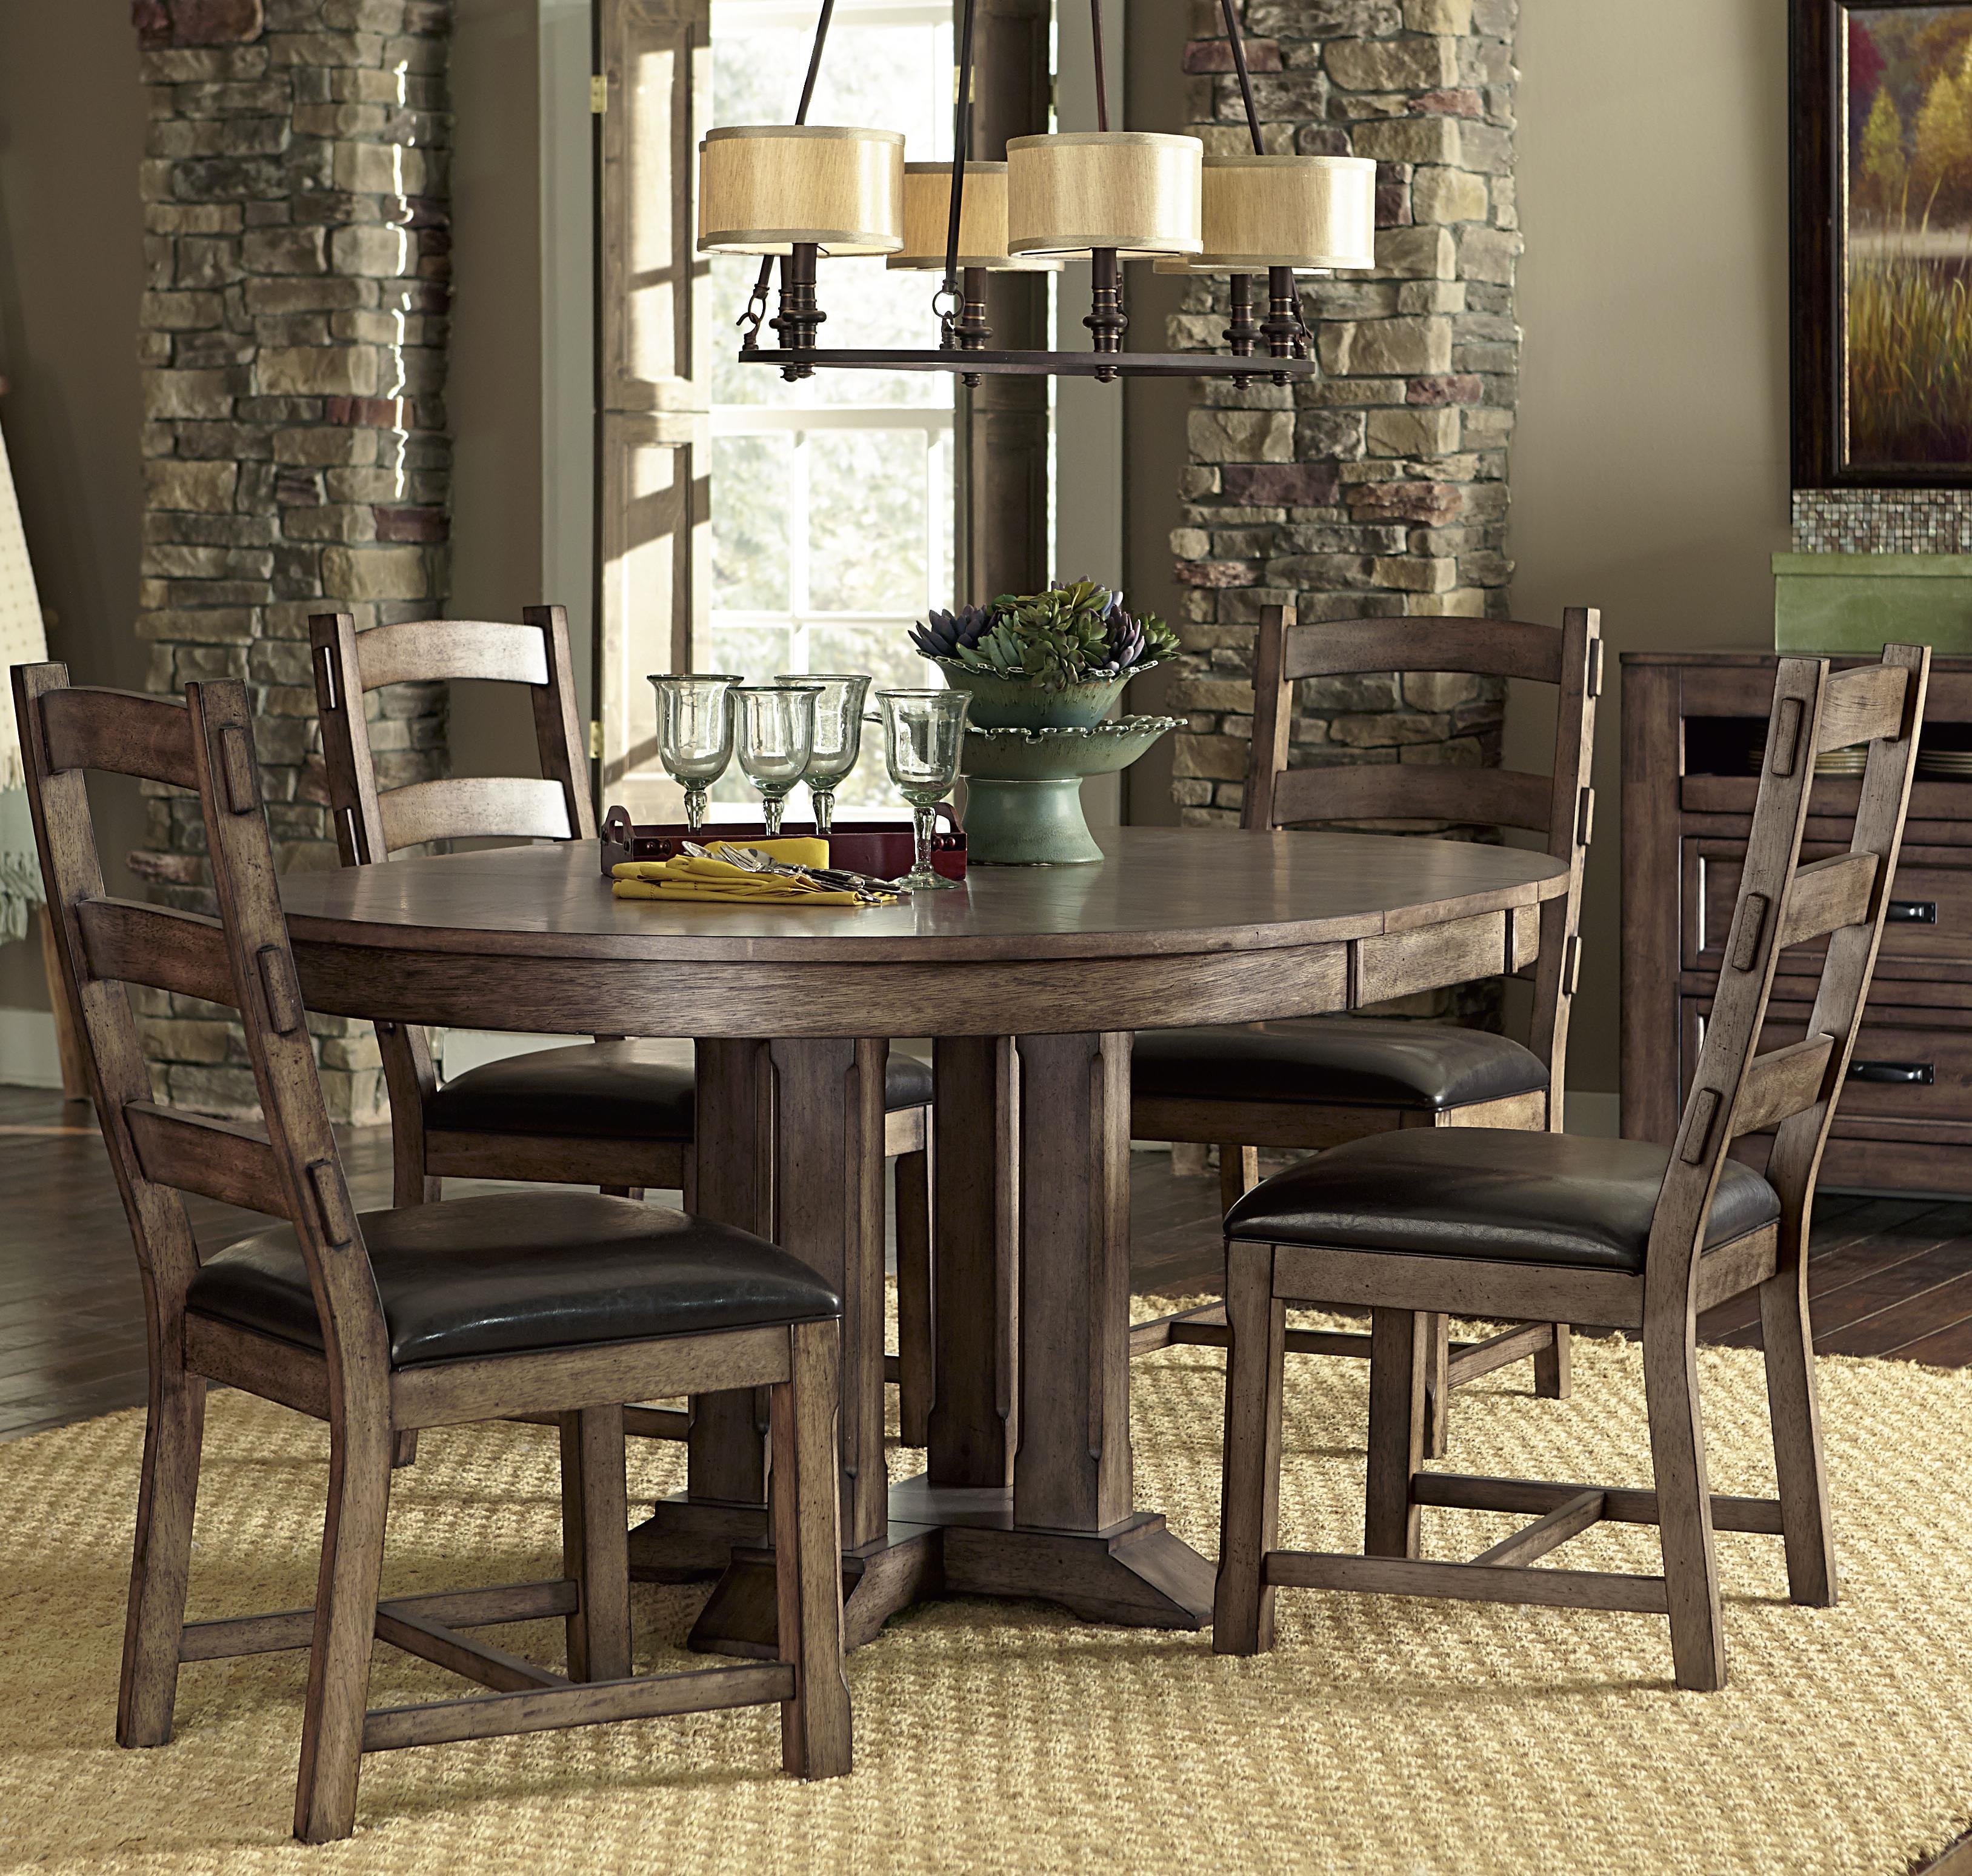 Progressive furniture boulder creek piece dining table